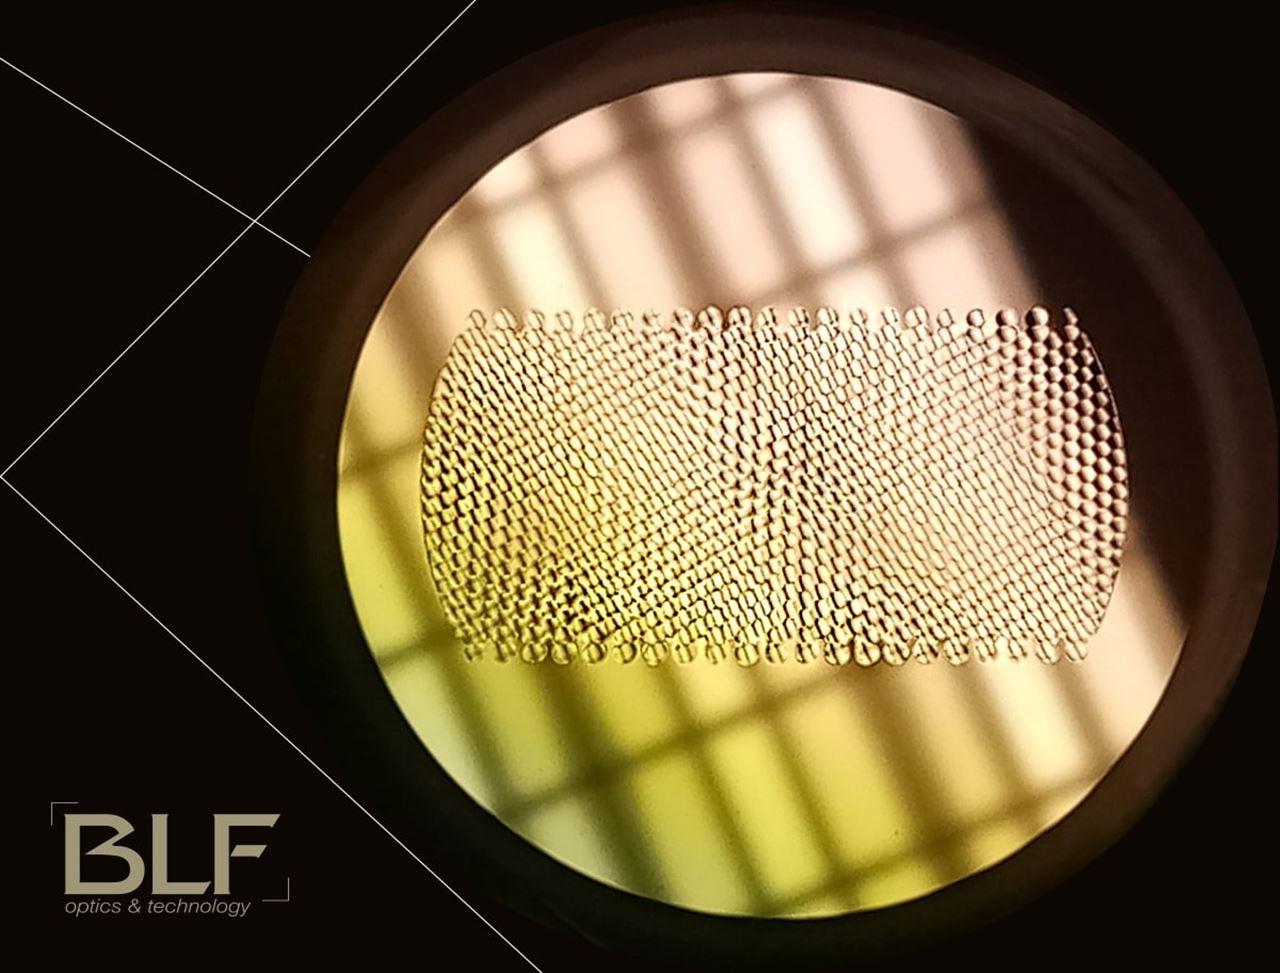 BLF Optik Teknoloji San. A.S.